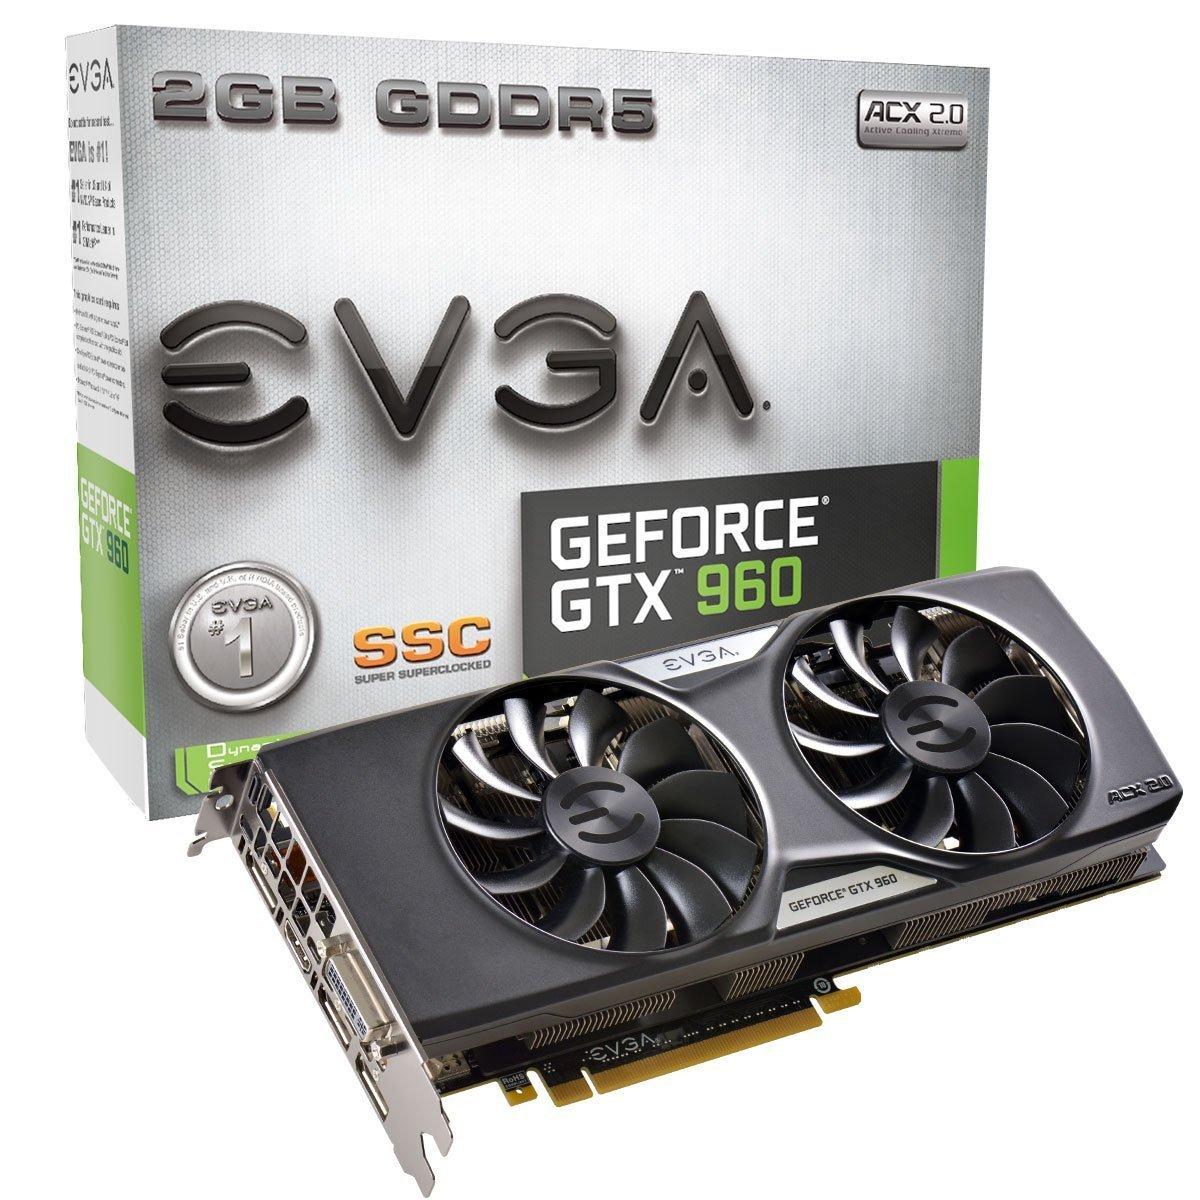 EVGA GeForce GTX 960 SuperSC ACX 2.0+ 2GB GDDR5 128bit, PCI-E 3.0 Dual-Link DVI-I, 3 x DP, HDMI, SLI, HDCP, G-SYNC Ready Graphics Cards 02G-P4-2966-KR